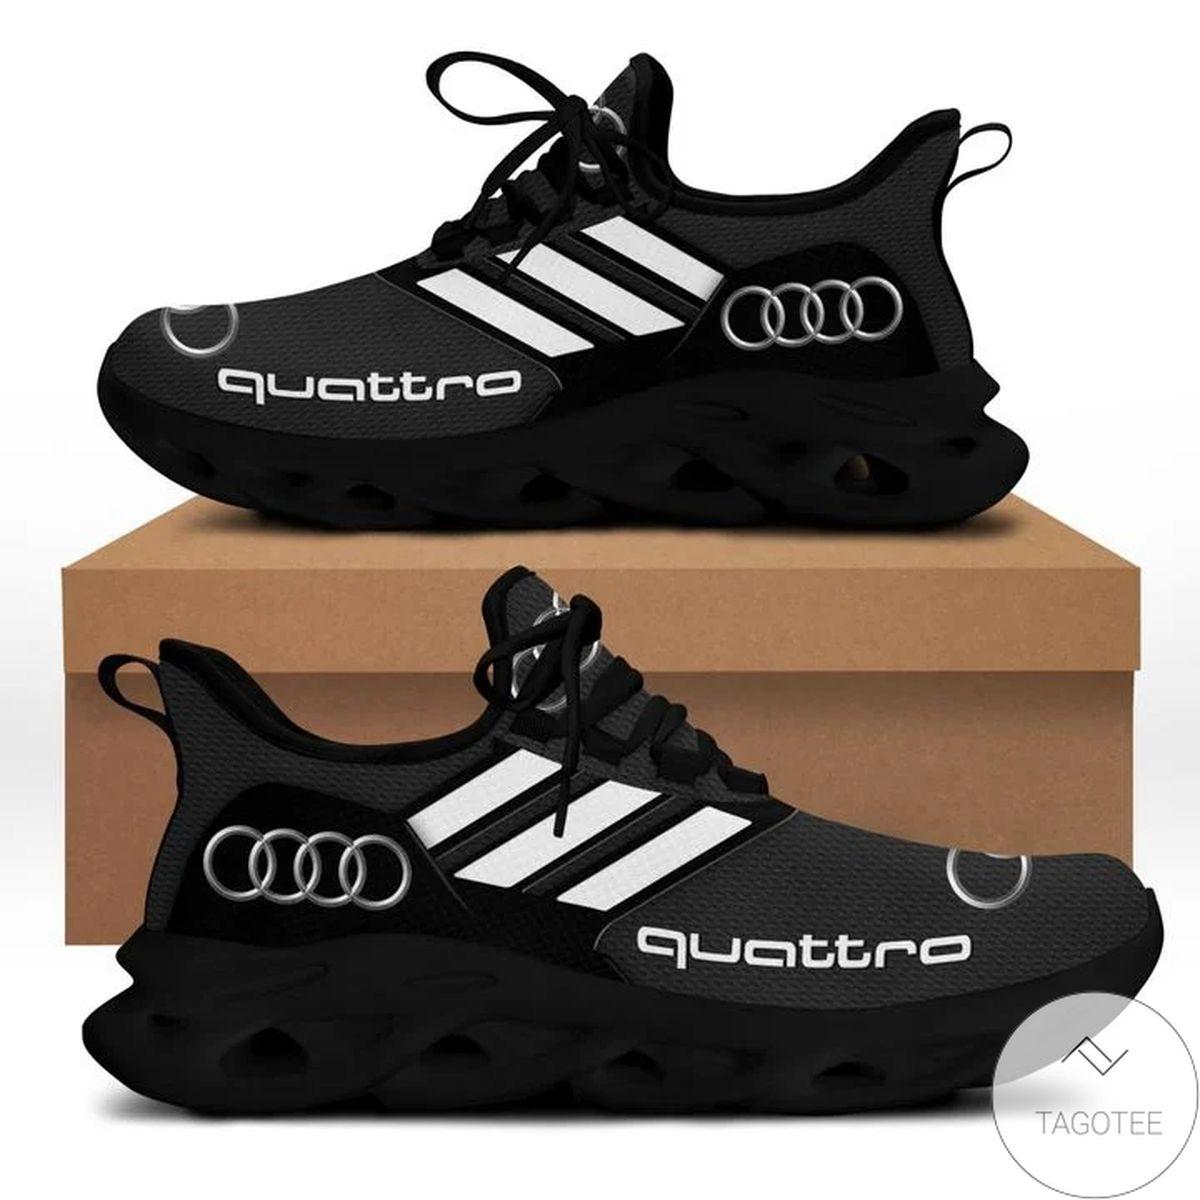 Audi Quattro Yeezy Running Sneaker Max Soul Shoes